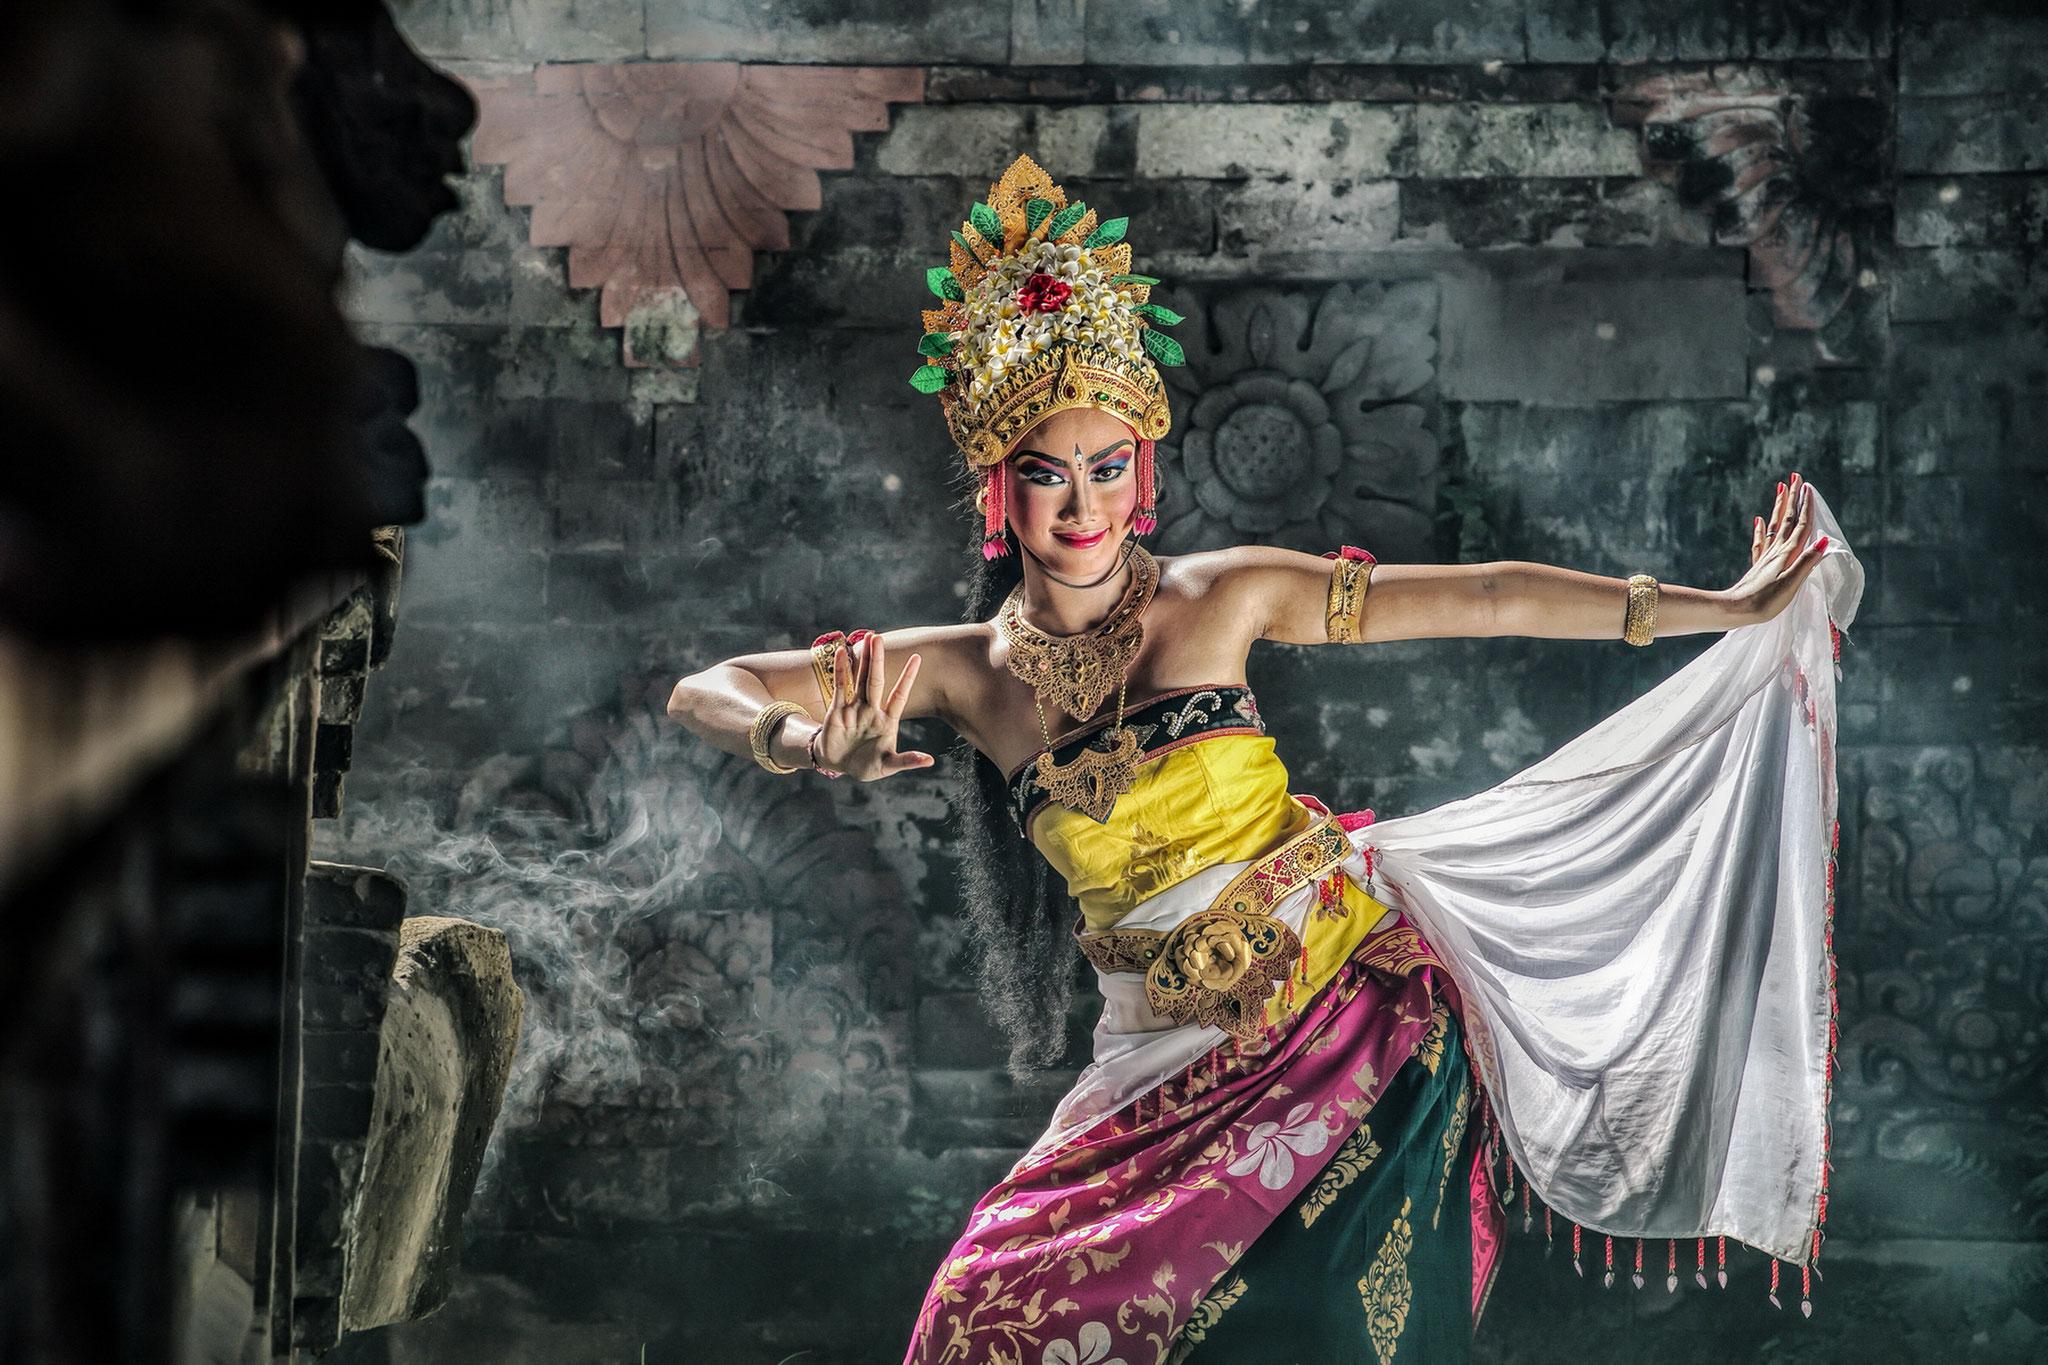 Chee Sze-Wah (Singapore) - Bali Dancer Swirl